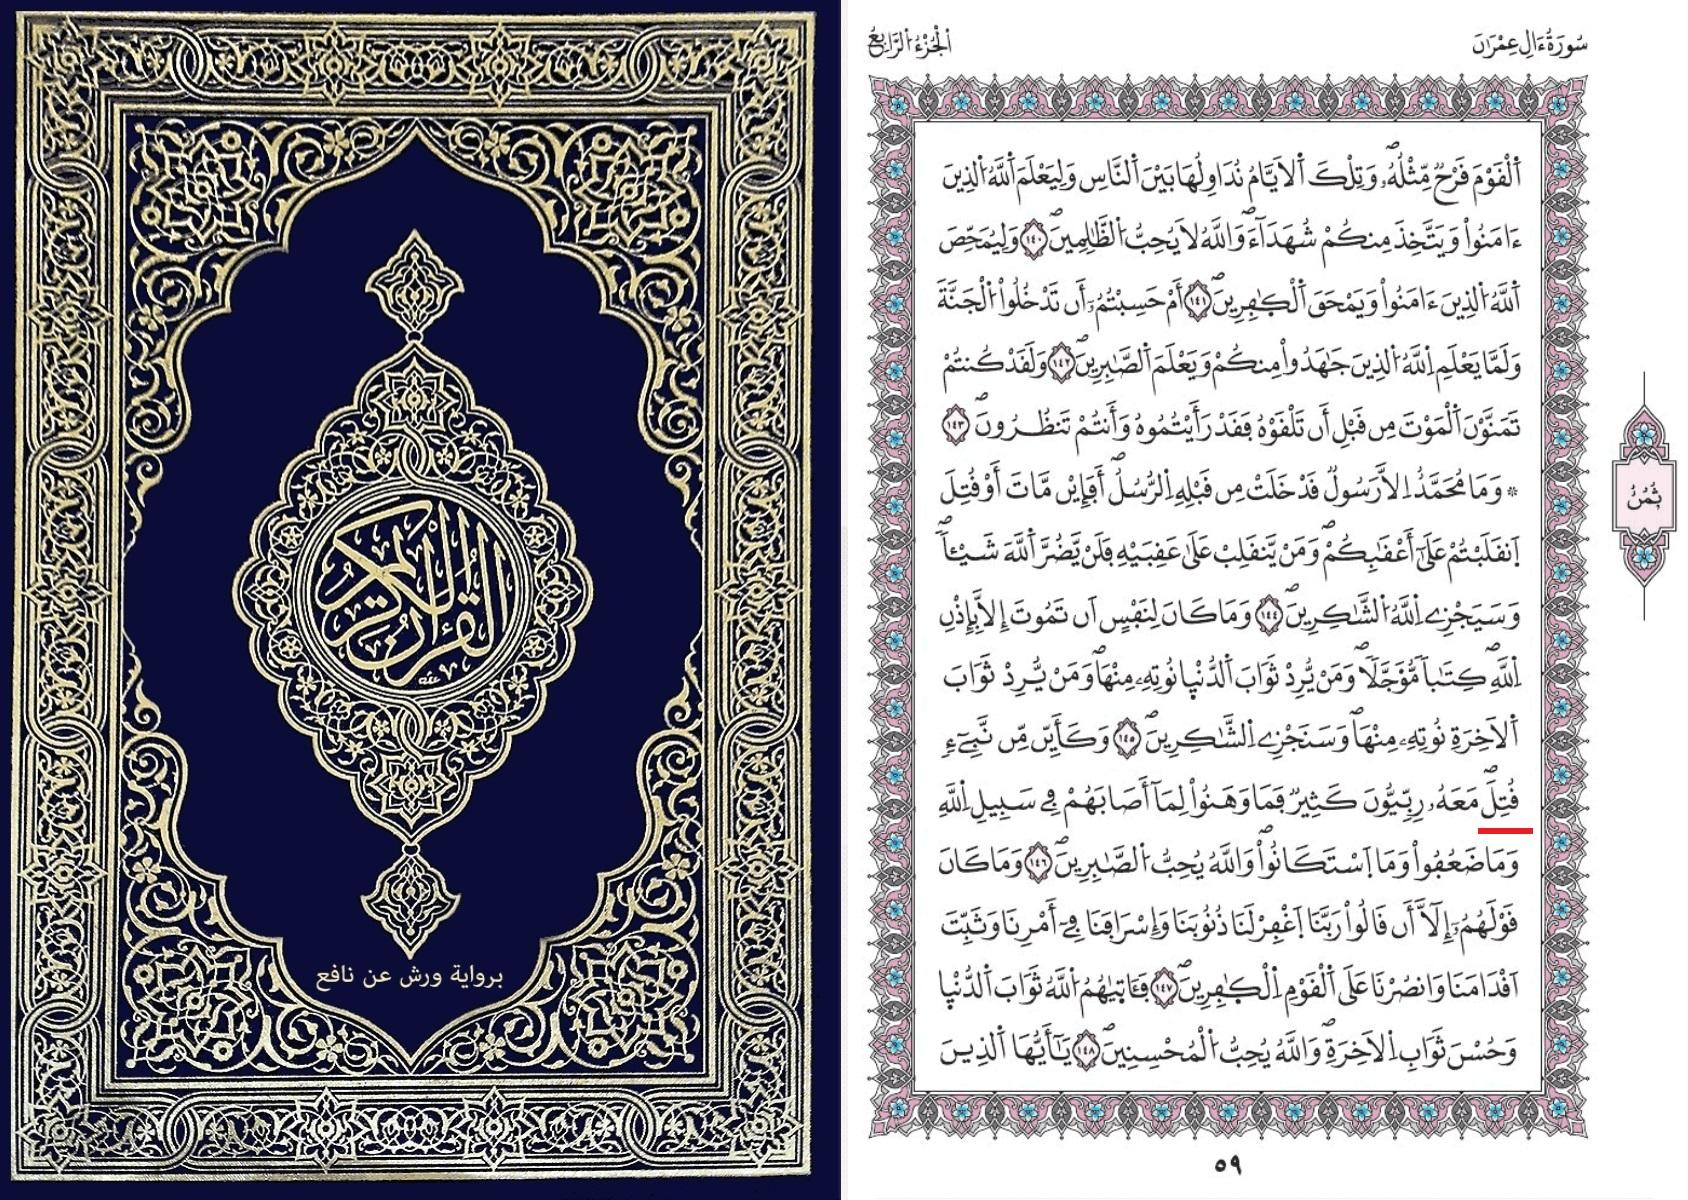 mos7af-e-warsh-ayat-e-Qutila